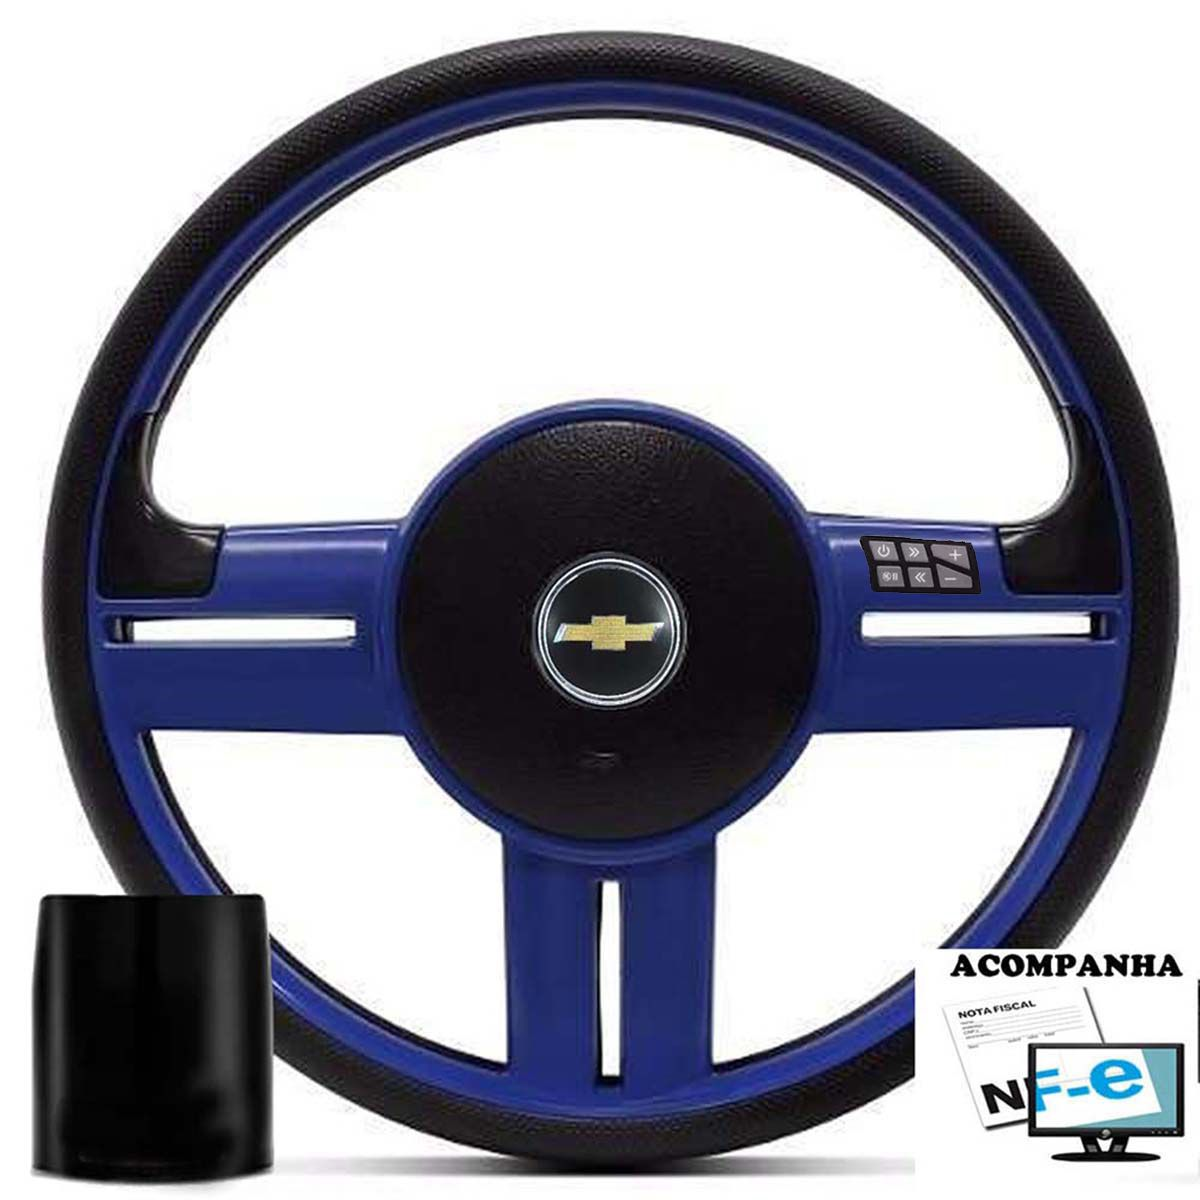 Volante Multifuncional Chevrolet Surf Rallye Esportivo Cubo Corsa Classic Wind Premium Joy Max Celta Poliparts